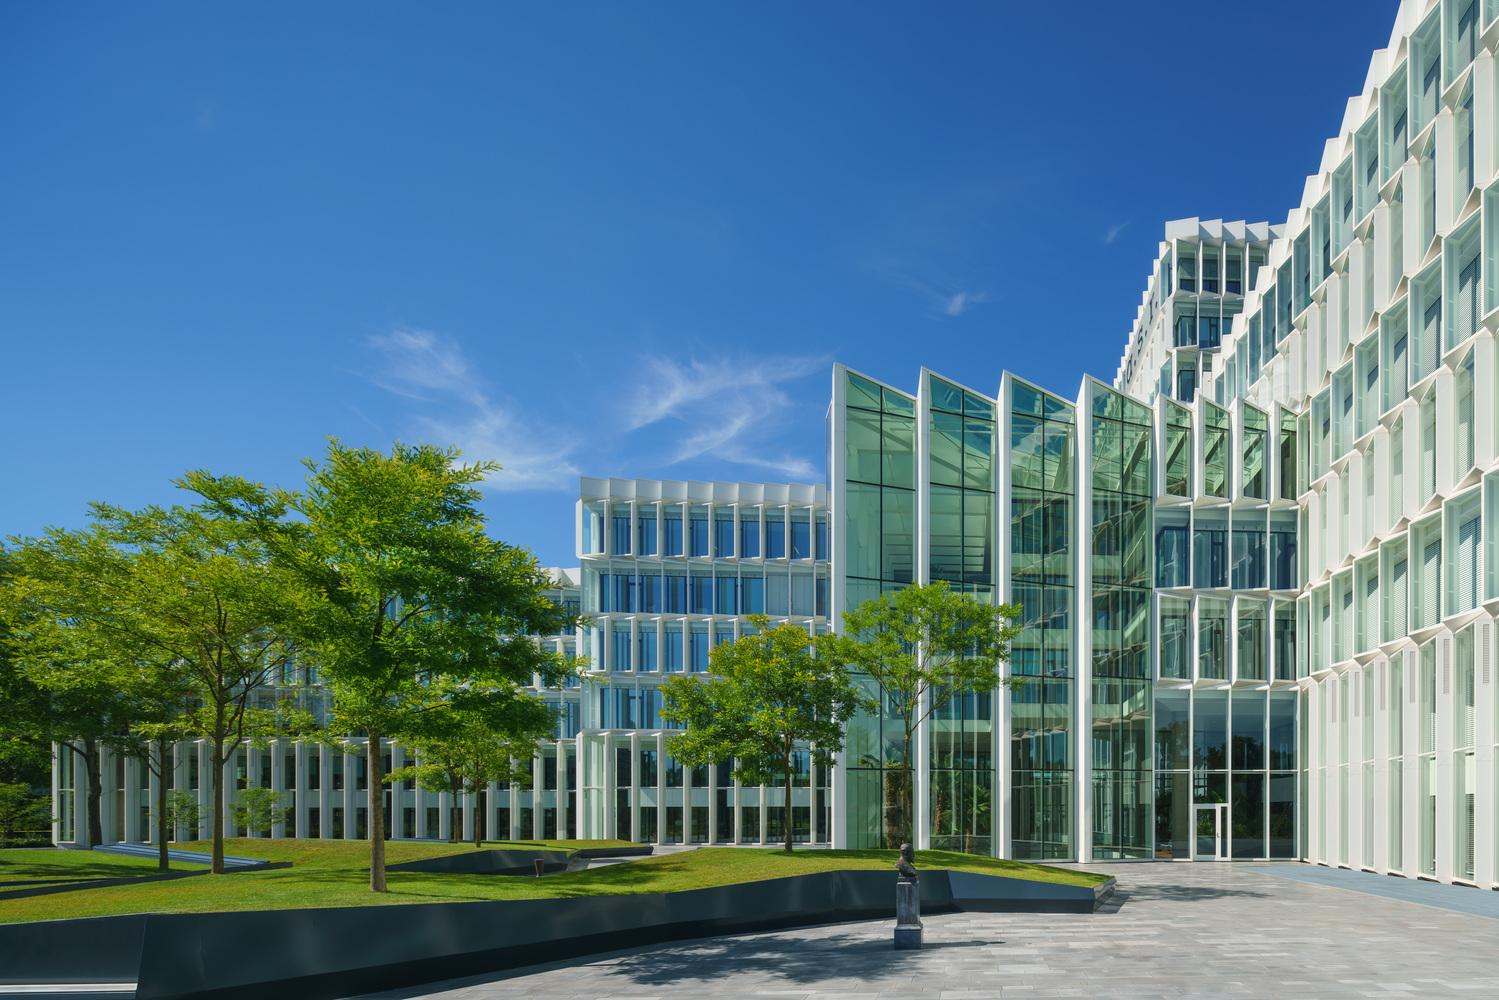 Team V Architectuur.Gallery Of A S R Headquarters Renovation Team V